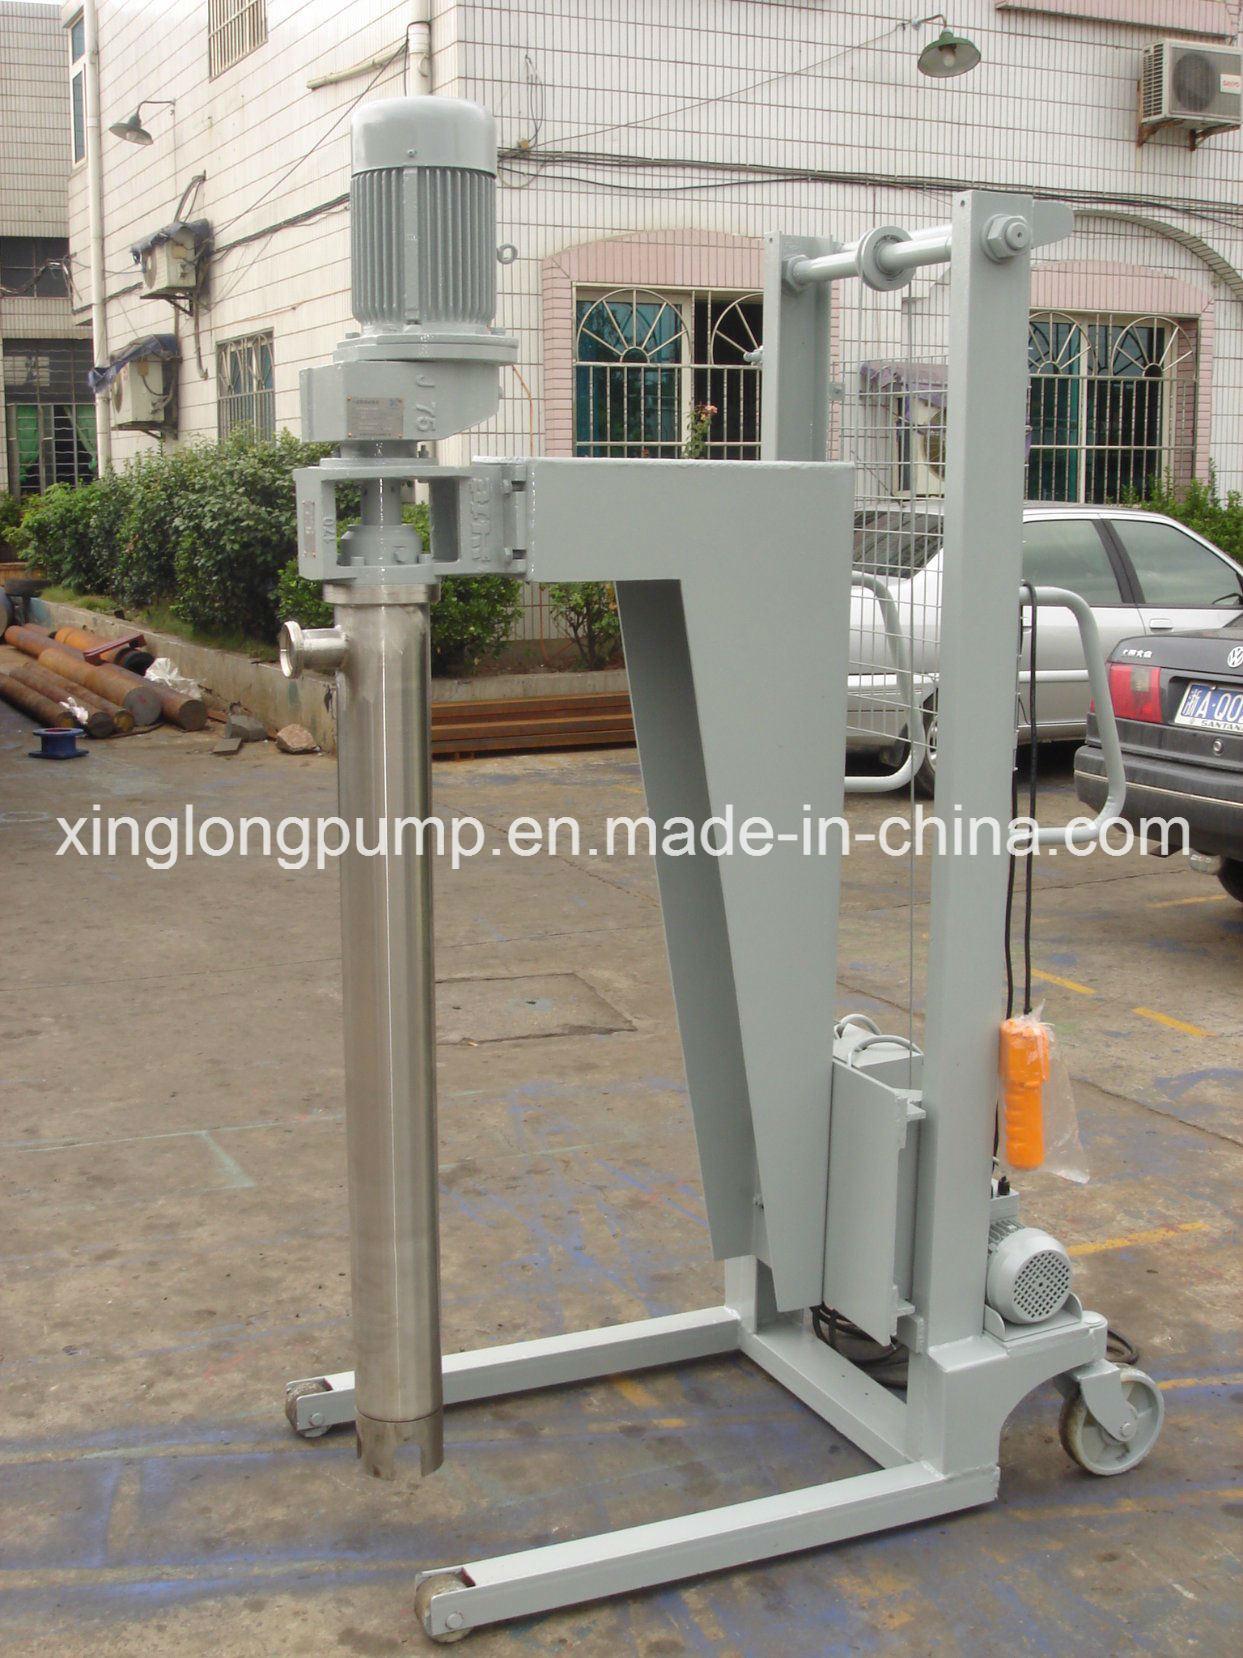 China Pump Manufacturer Xg Type Mono Progressing Pump